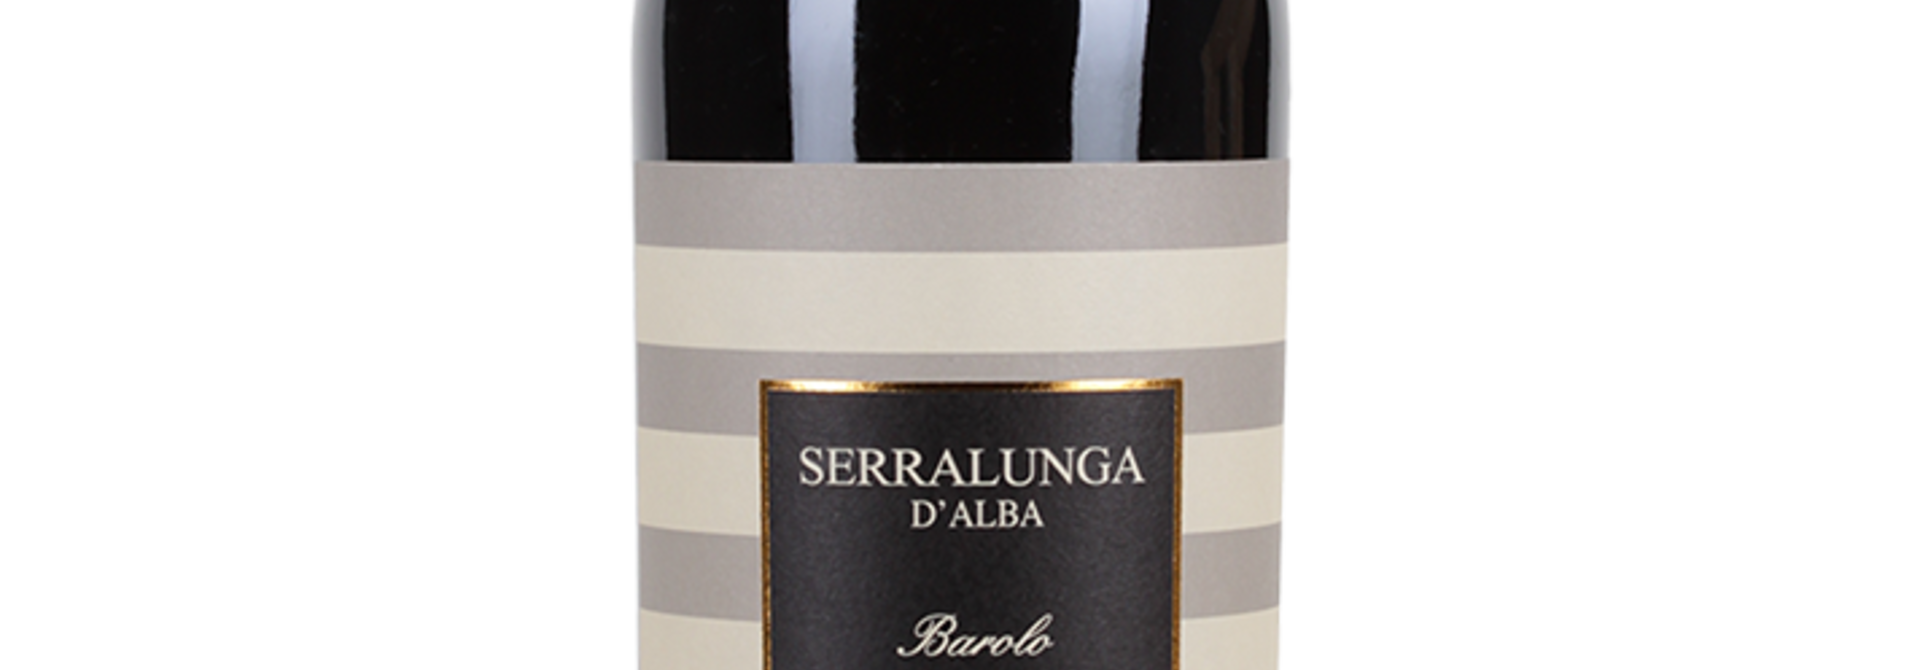 Barolo DOCG Serralunga d'Alba